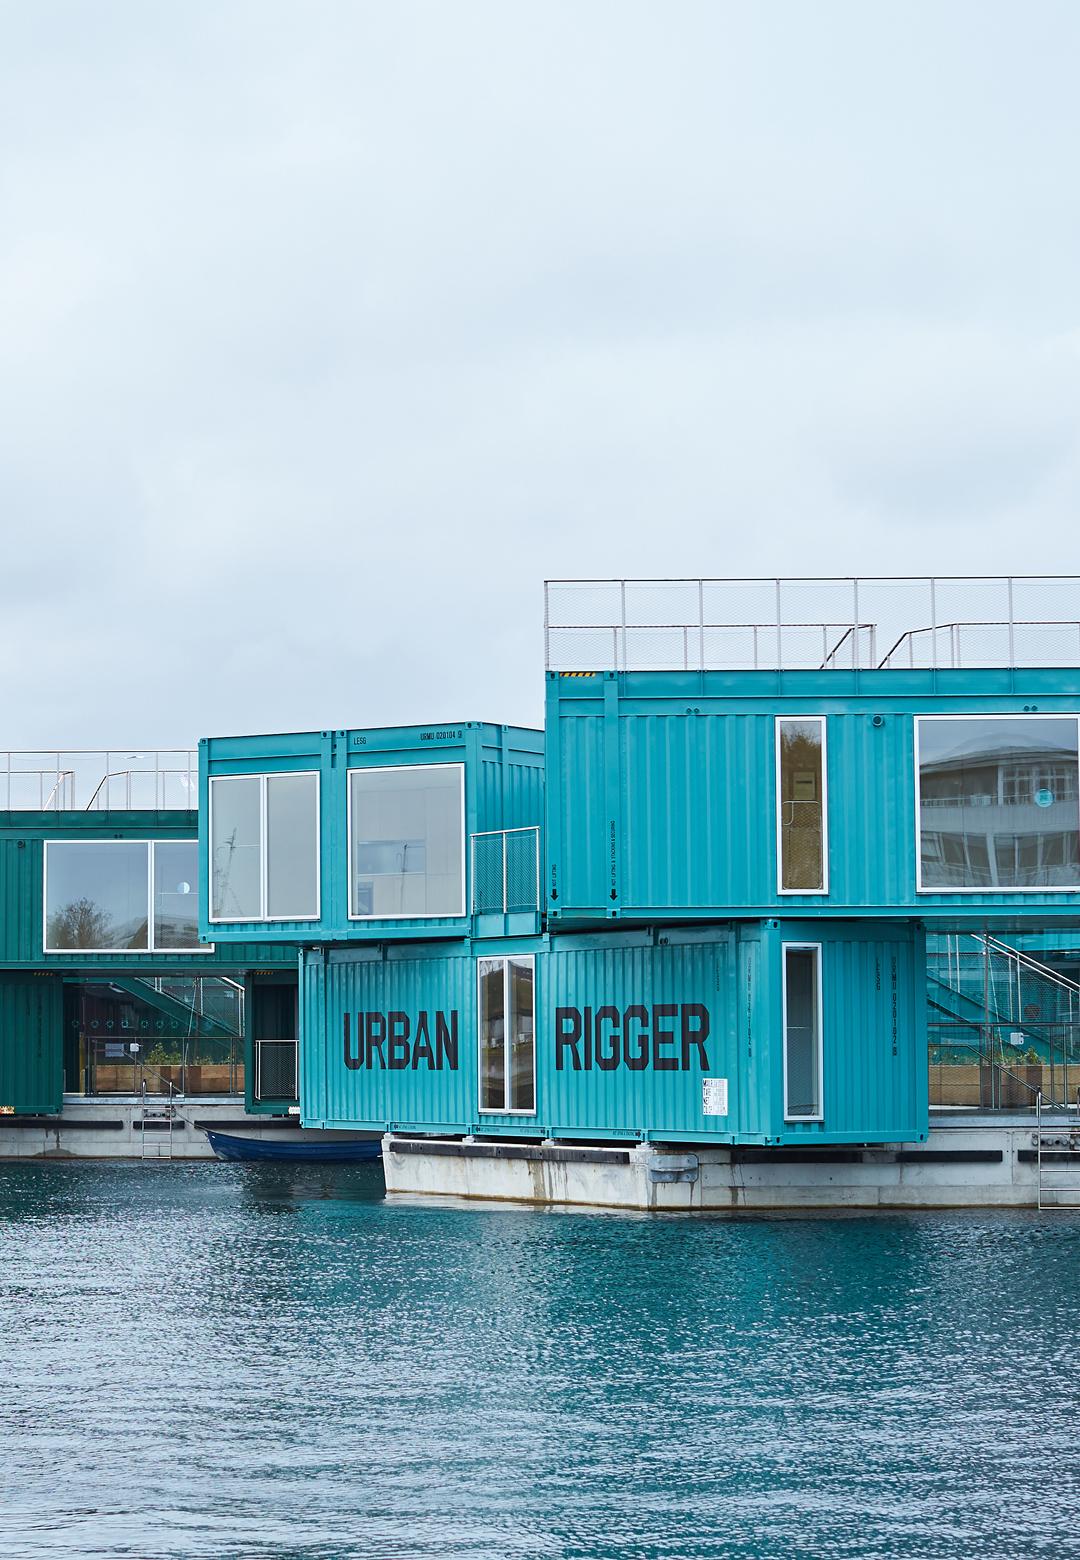 : Affordable student housing 'Urban Rigger' by BIG, in Copenhagen, Denmark | Urban Rigger student housing| BIG | STIRworld